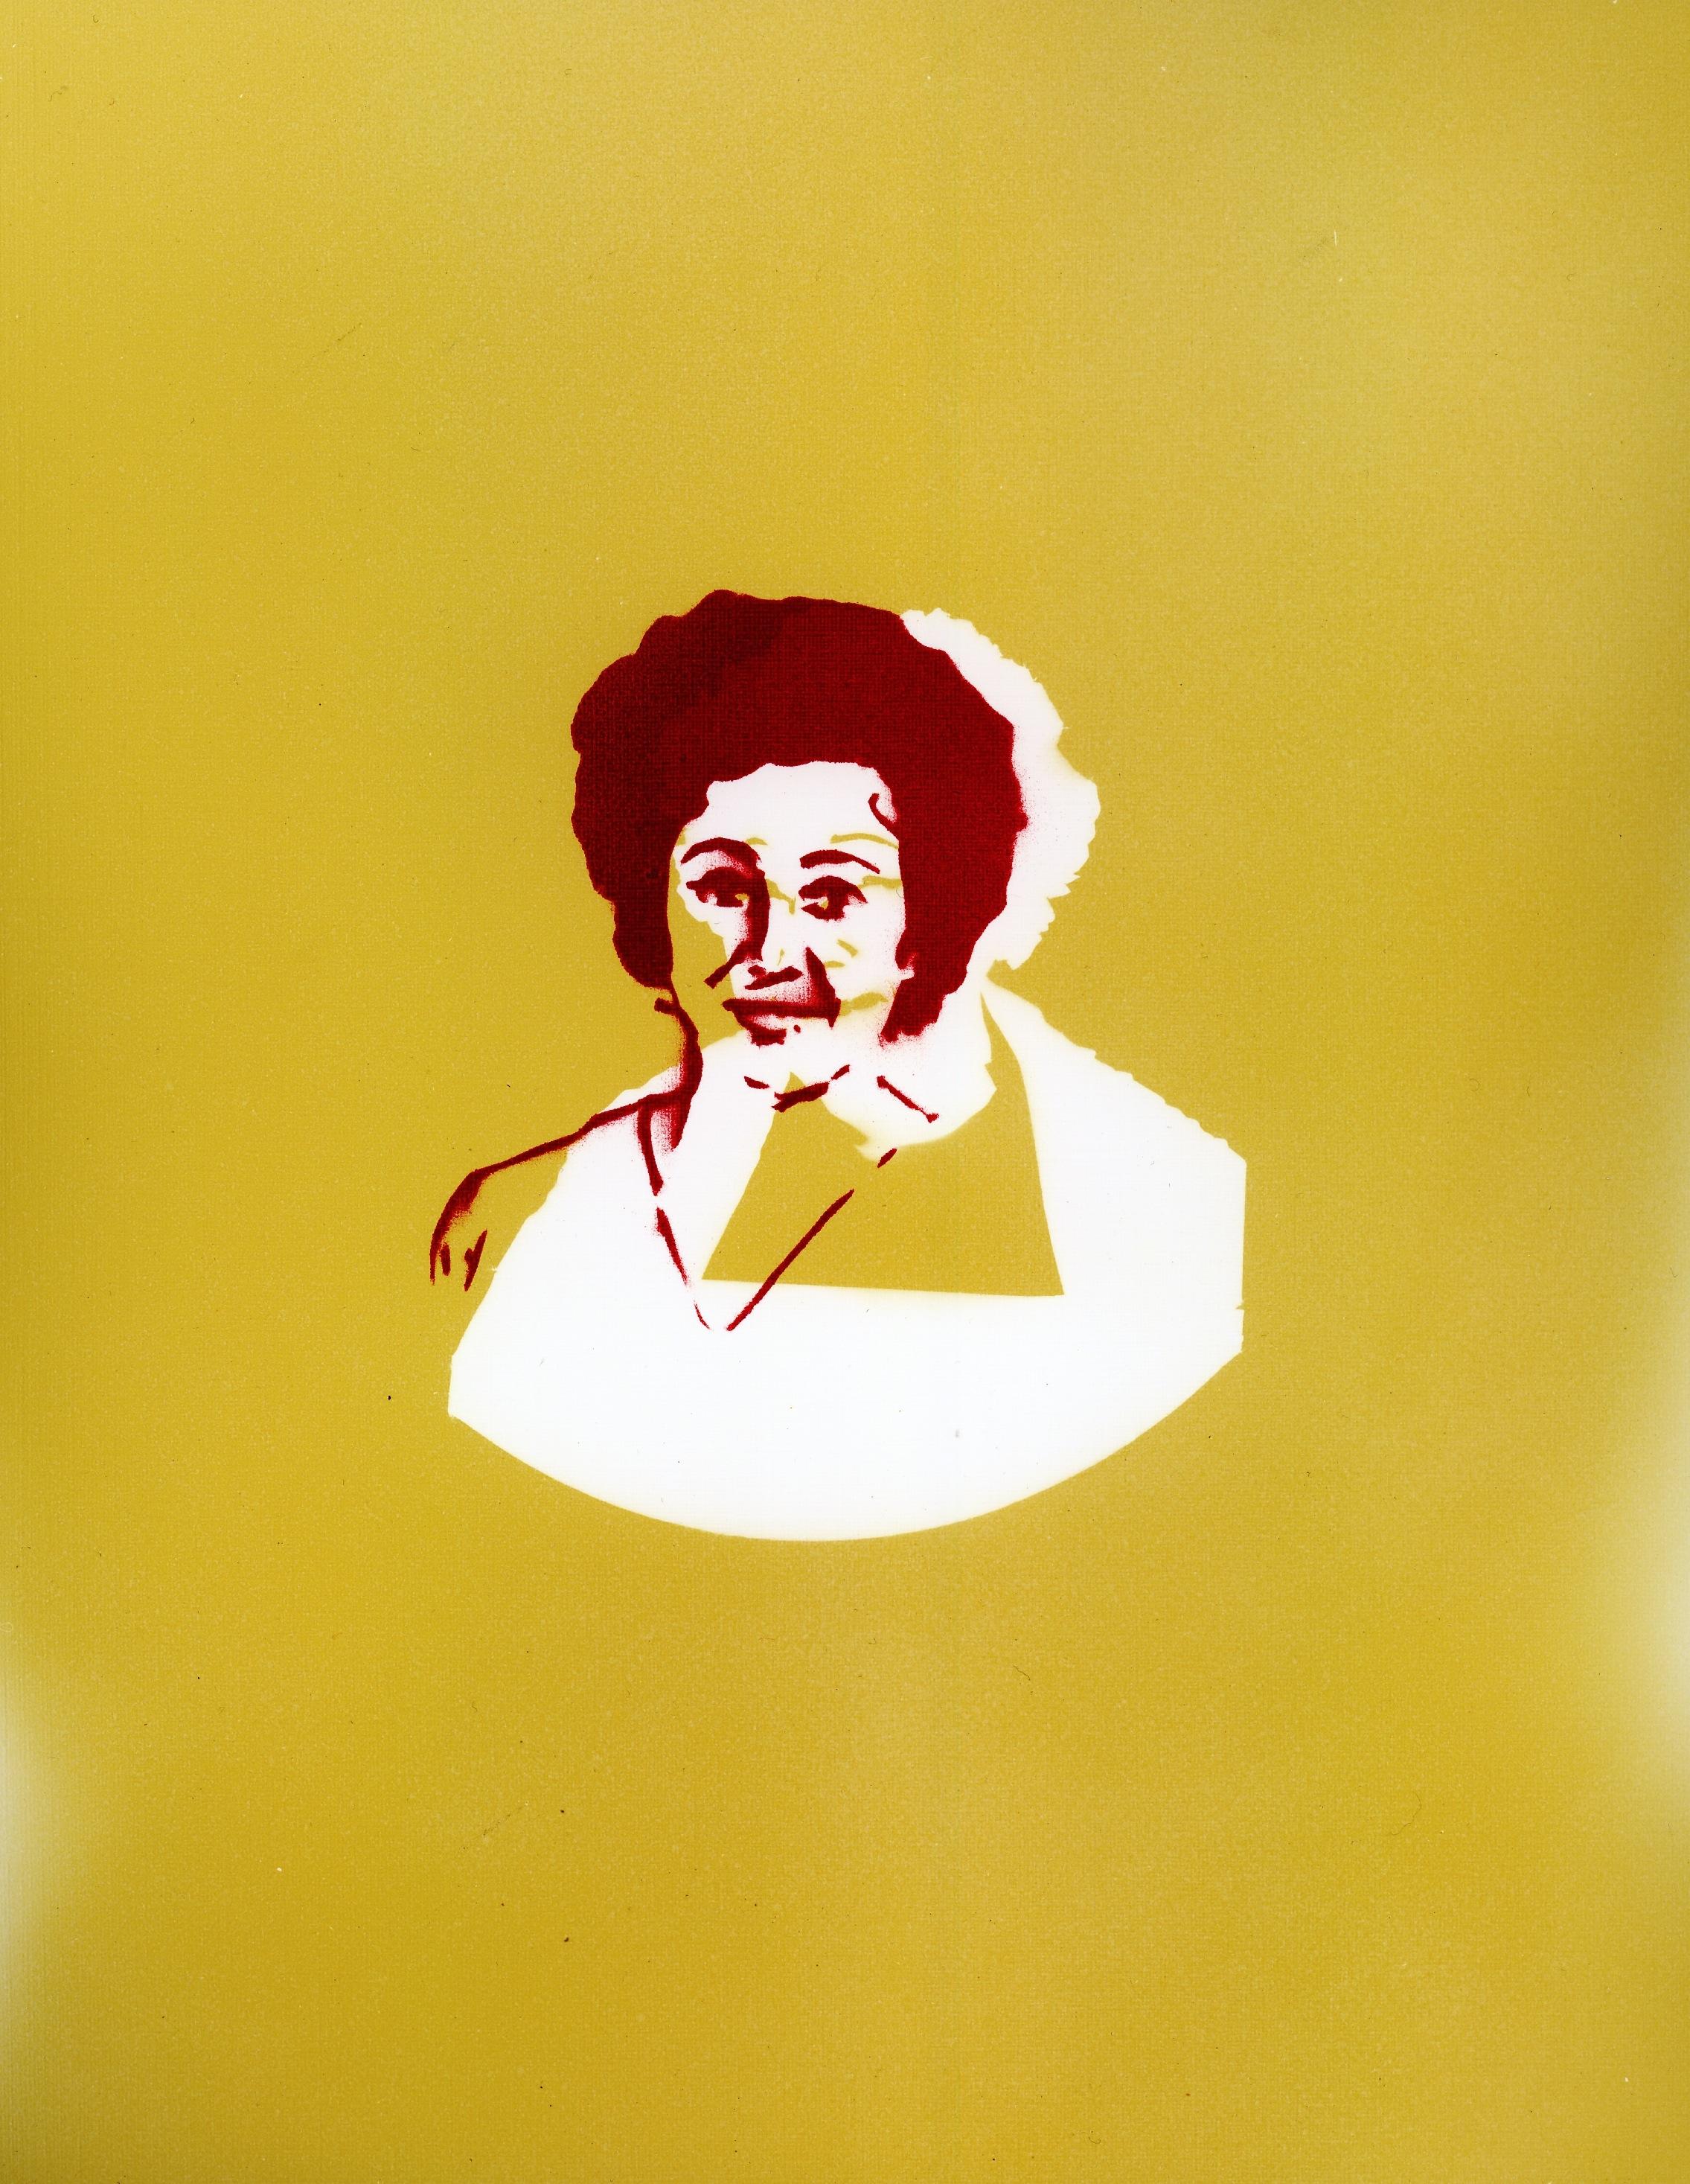 Tamara Liu, incense smoke oil and spray paint on paper, 2011